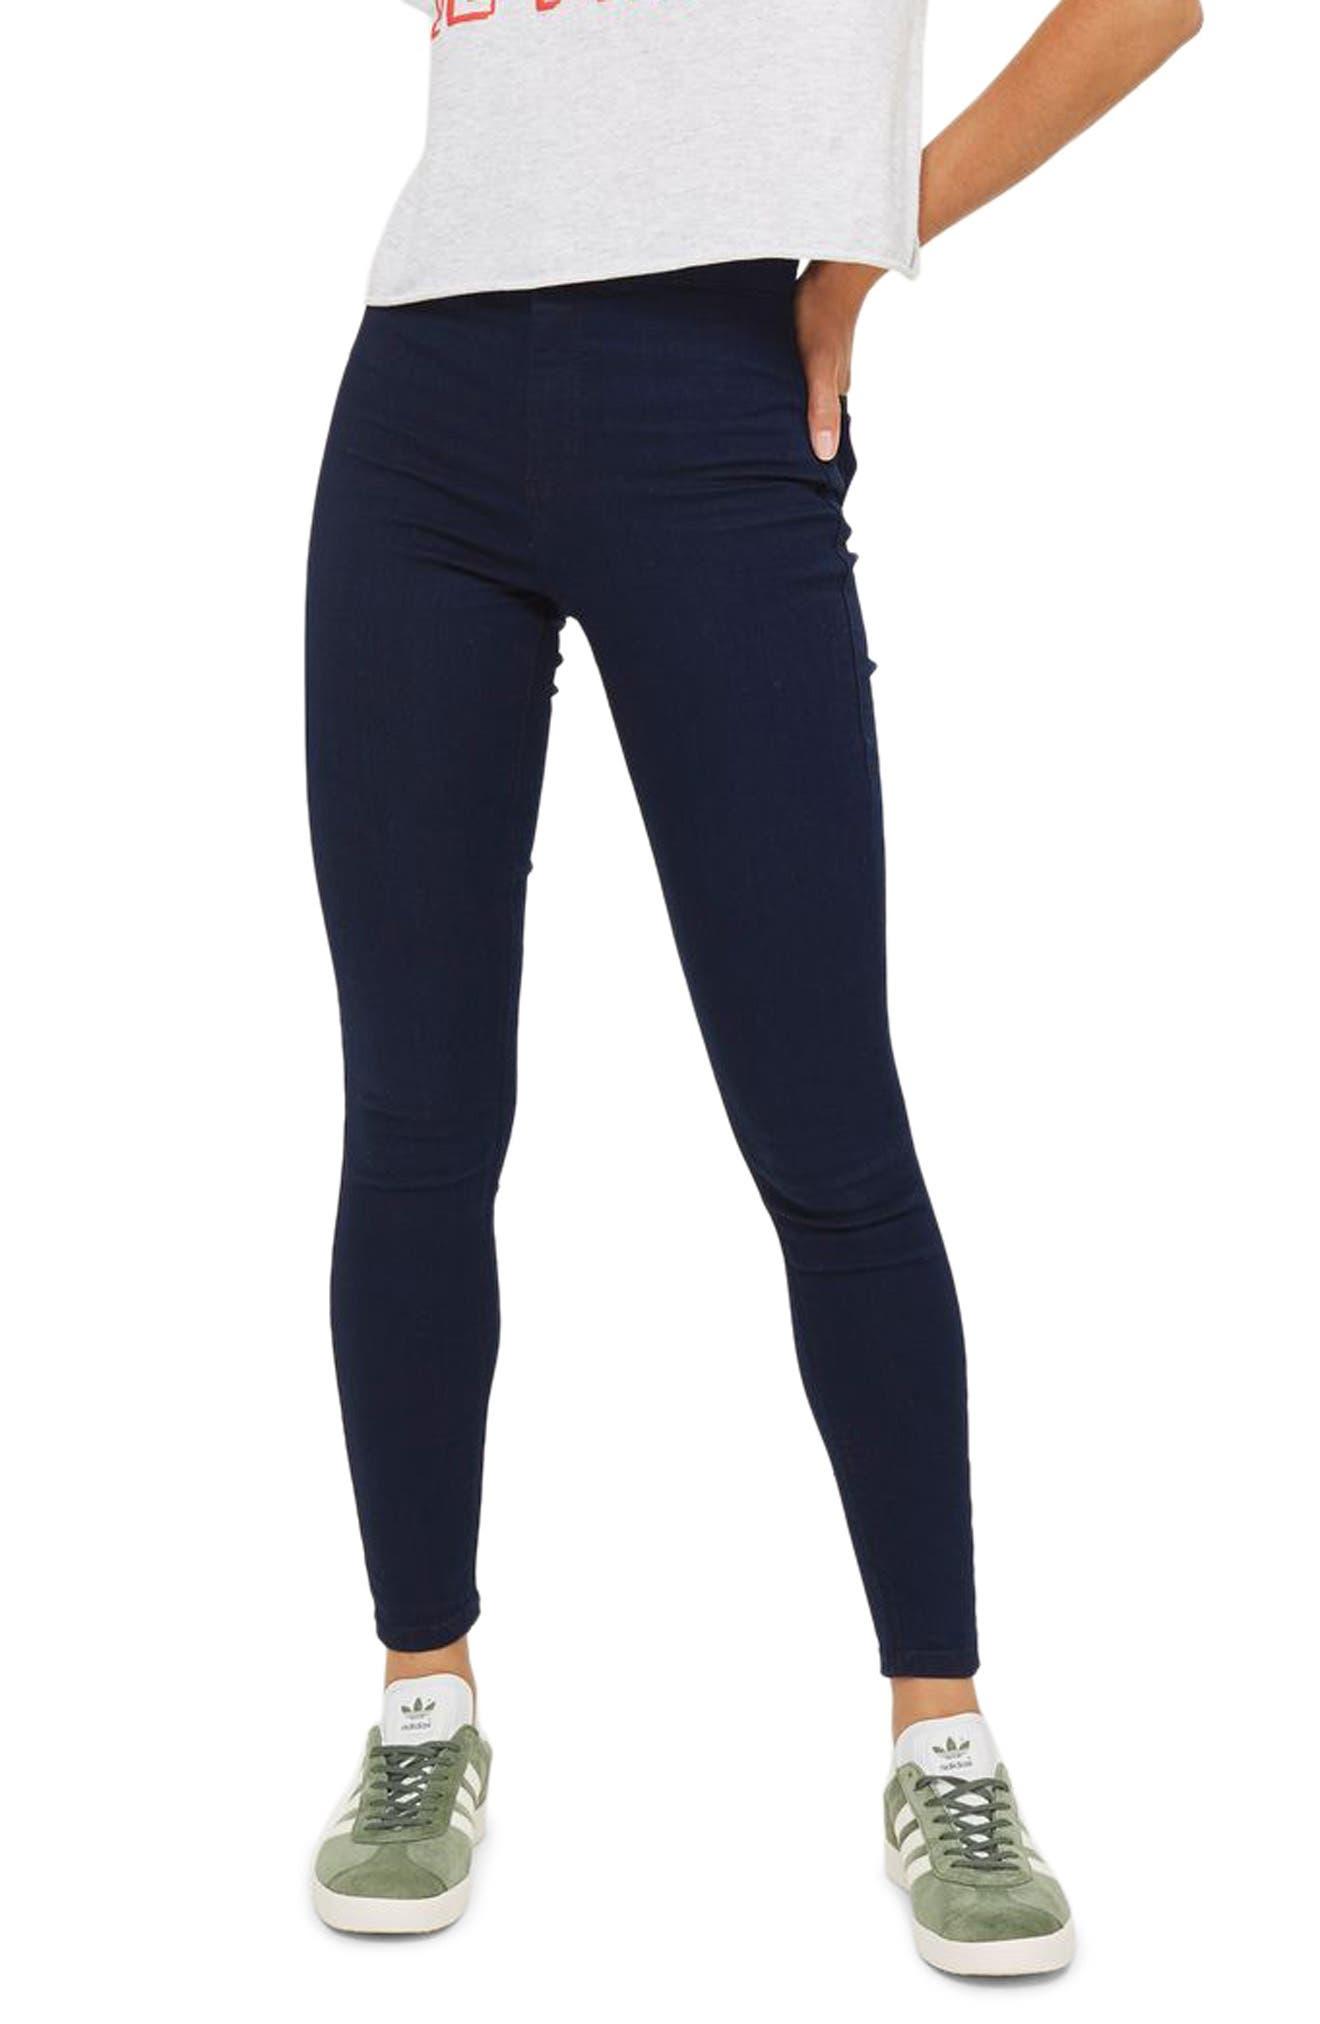 Joni High Waist Skinny Jeans,                             Main thumbnail 1, color,                             Dark Indigo